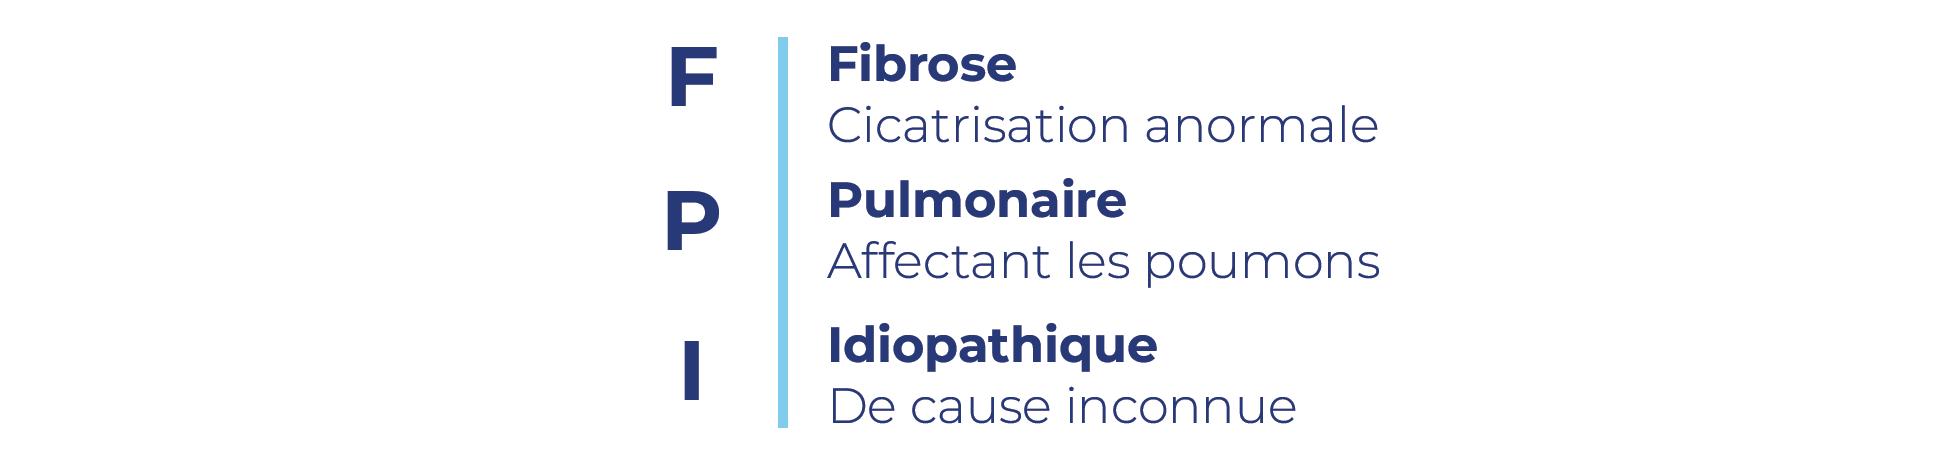 Fibrose Pulmonaire Idiopathique